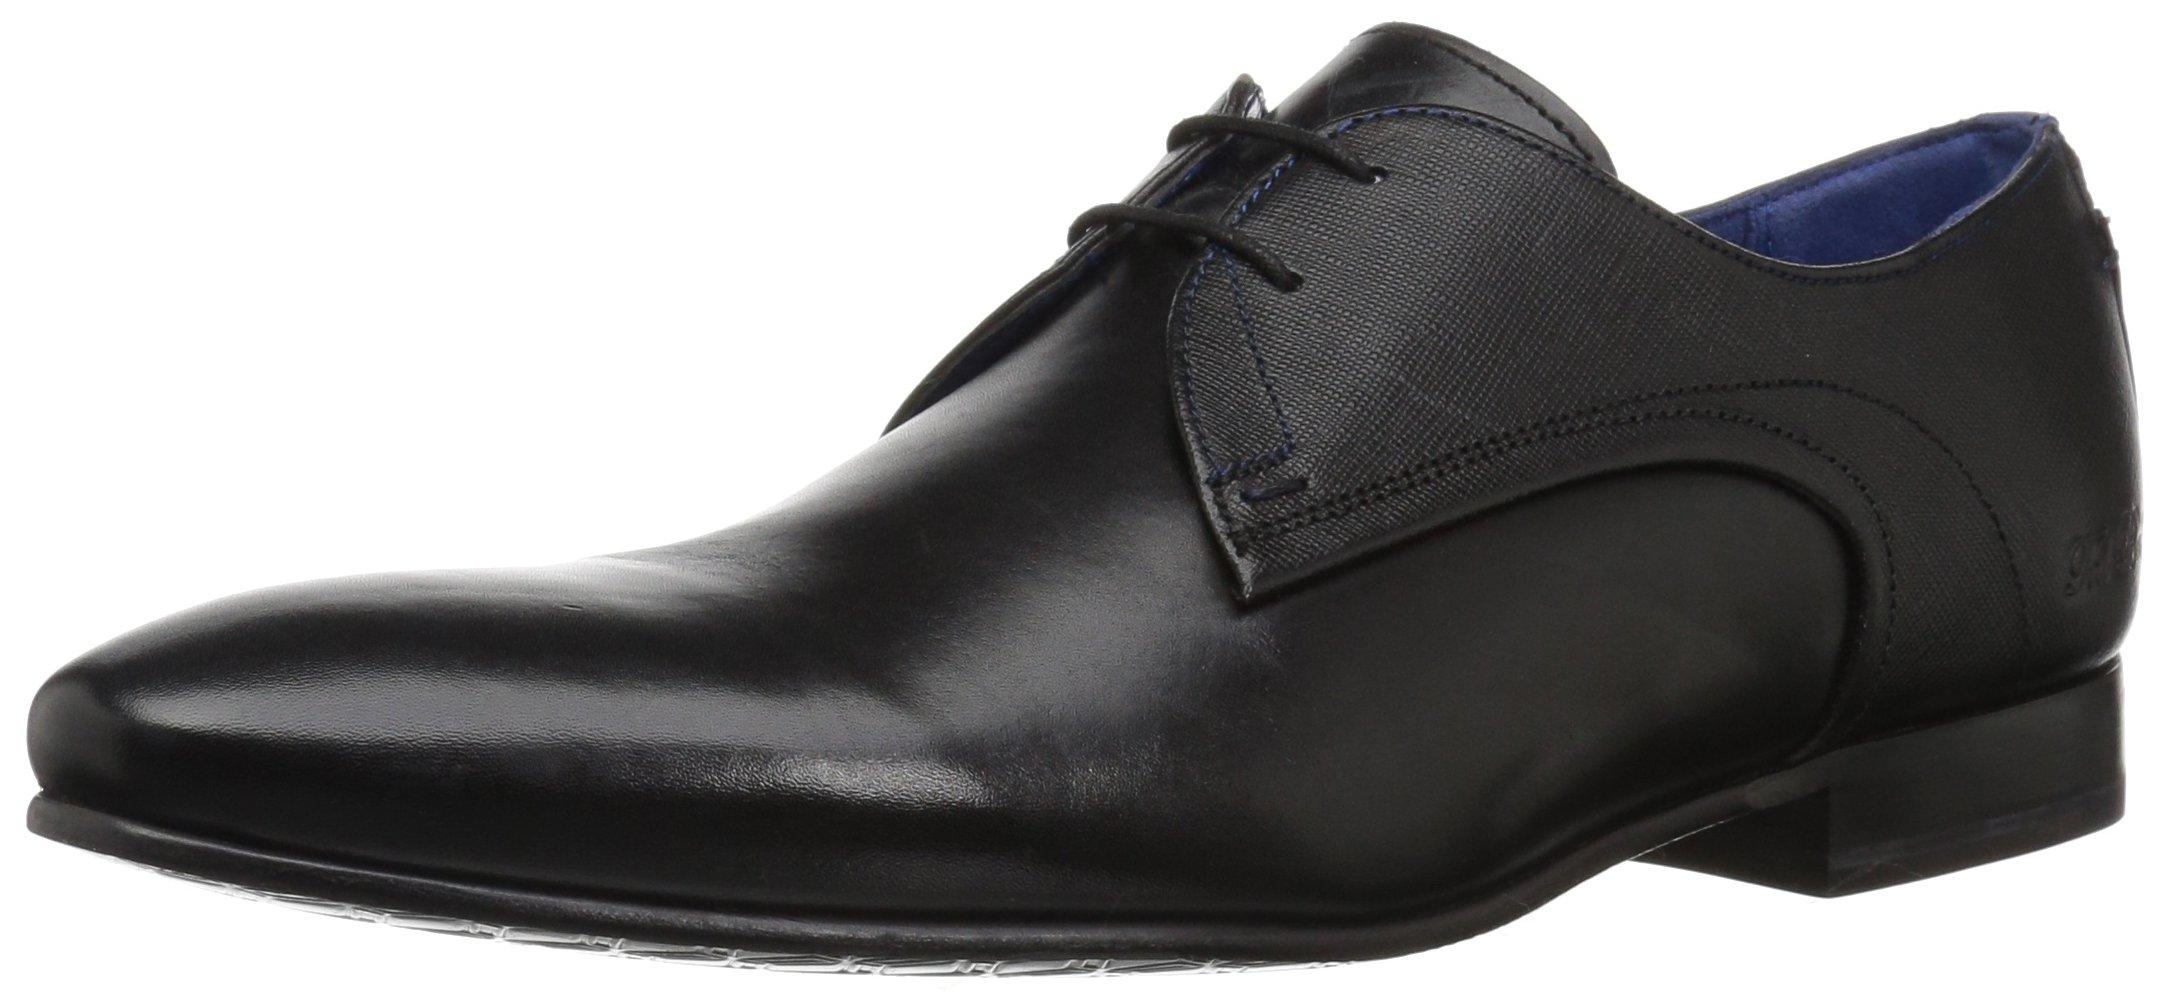 Ted Baker Men's Peair Oxford, Black, 13 D(M) US